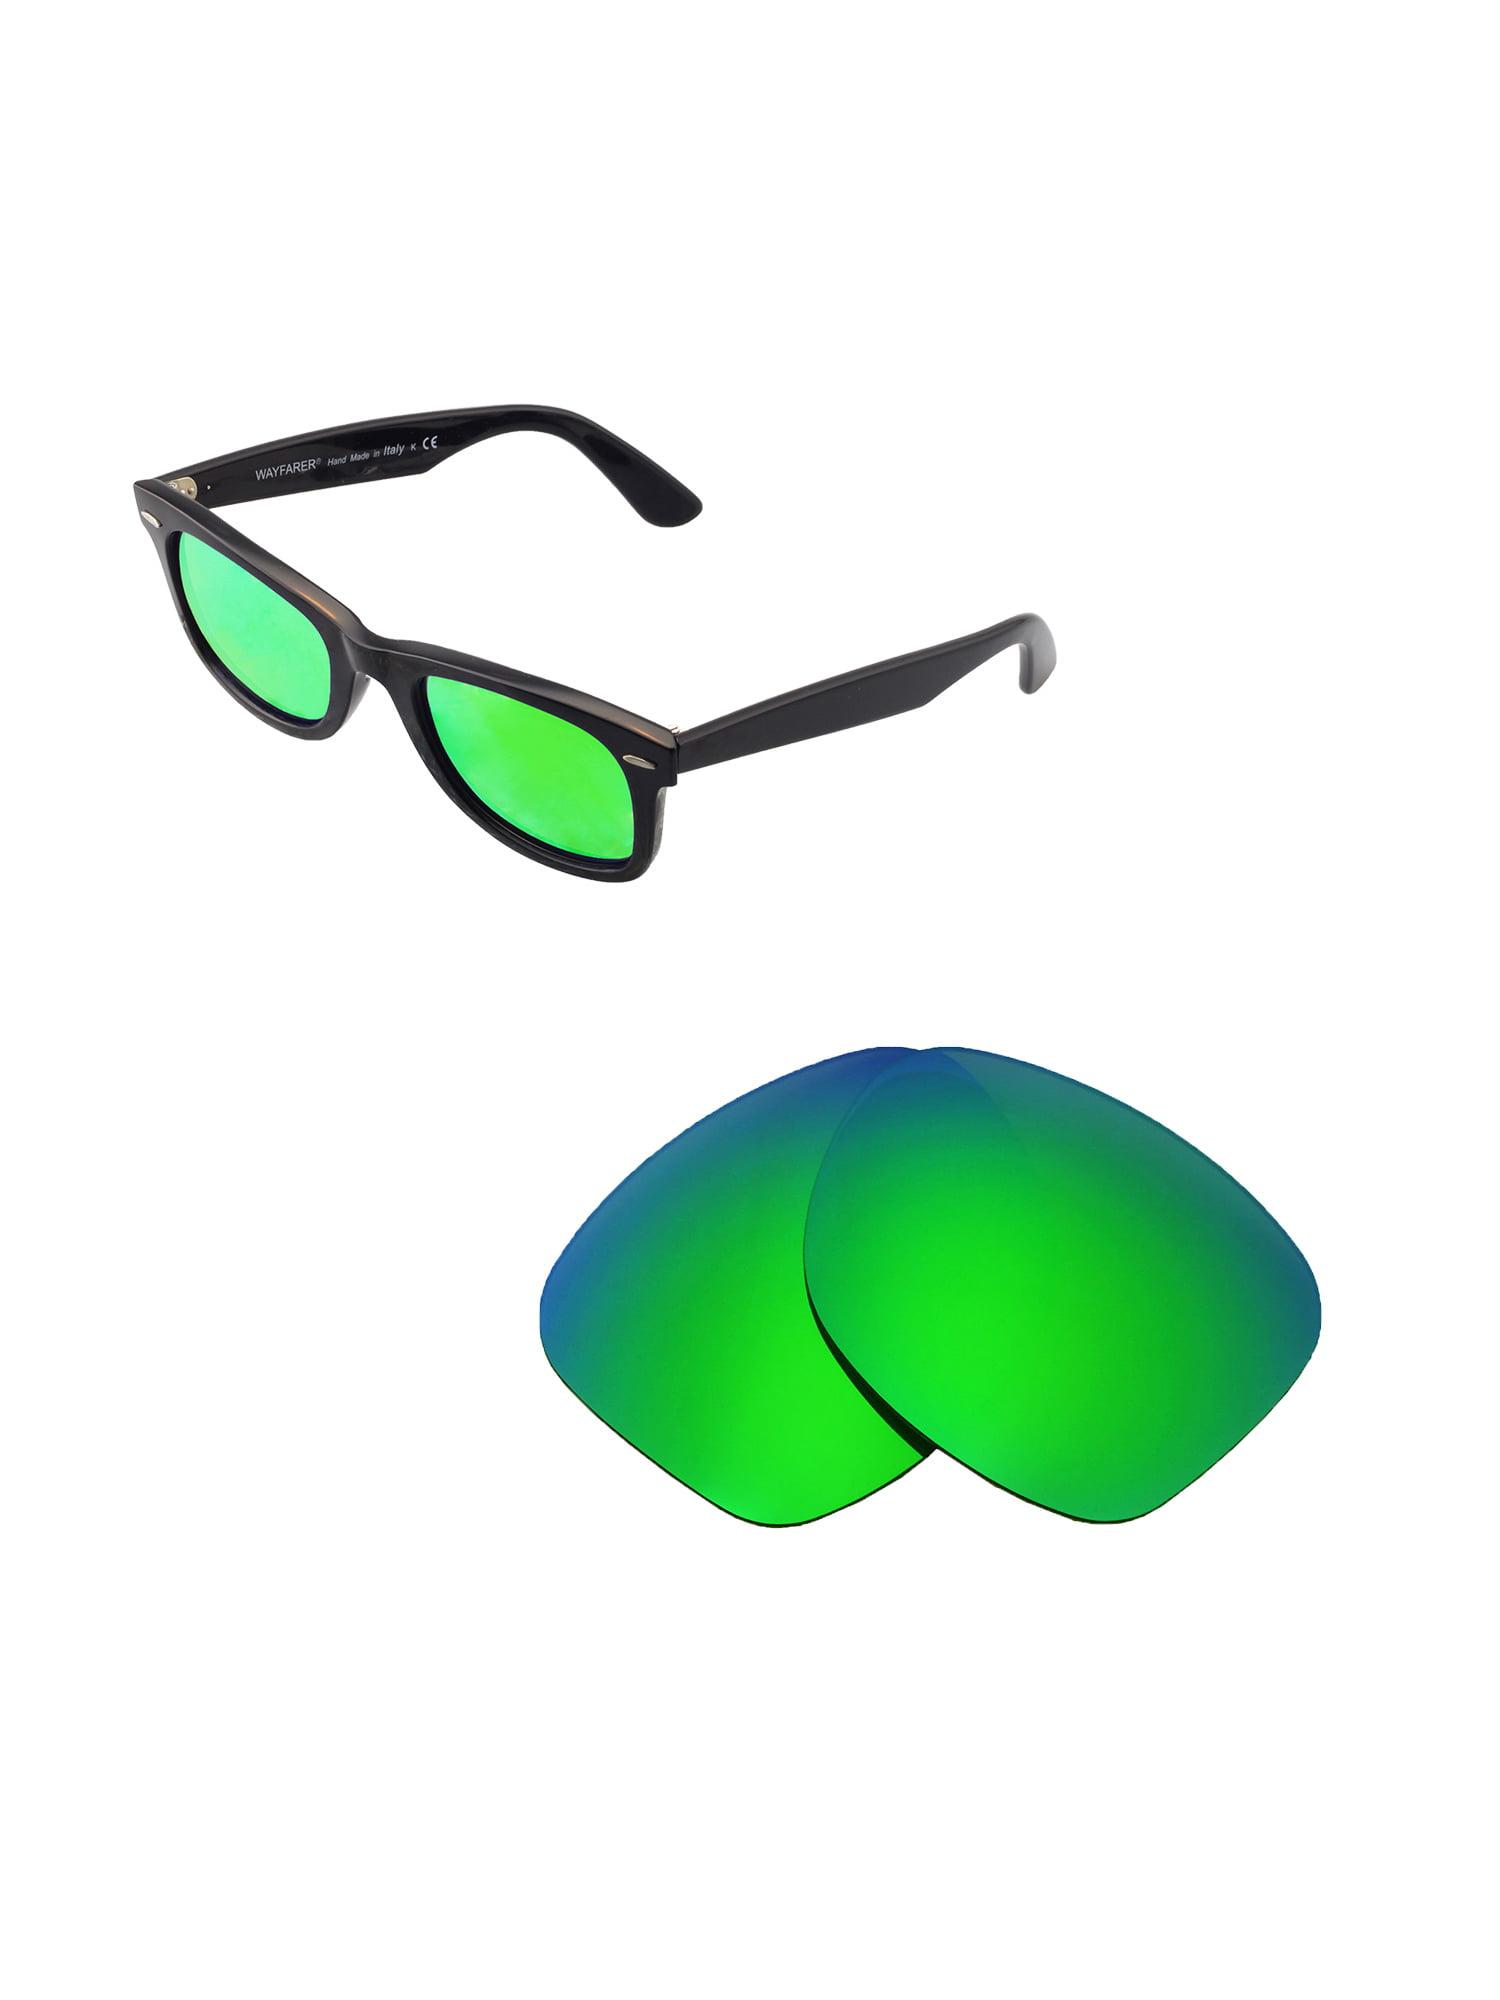 5a9e0efba65 Walleva - Walleva Brown Polarized Replacement Lenses for Ray-Ban Wayfarer  RB2140 50mm Sunglasses - Walmart.com